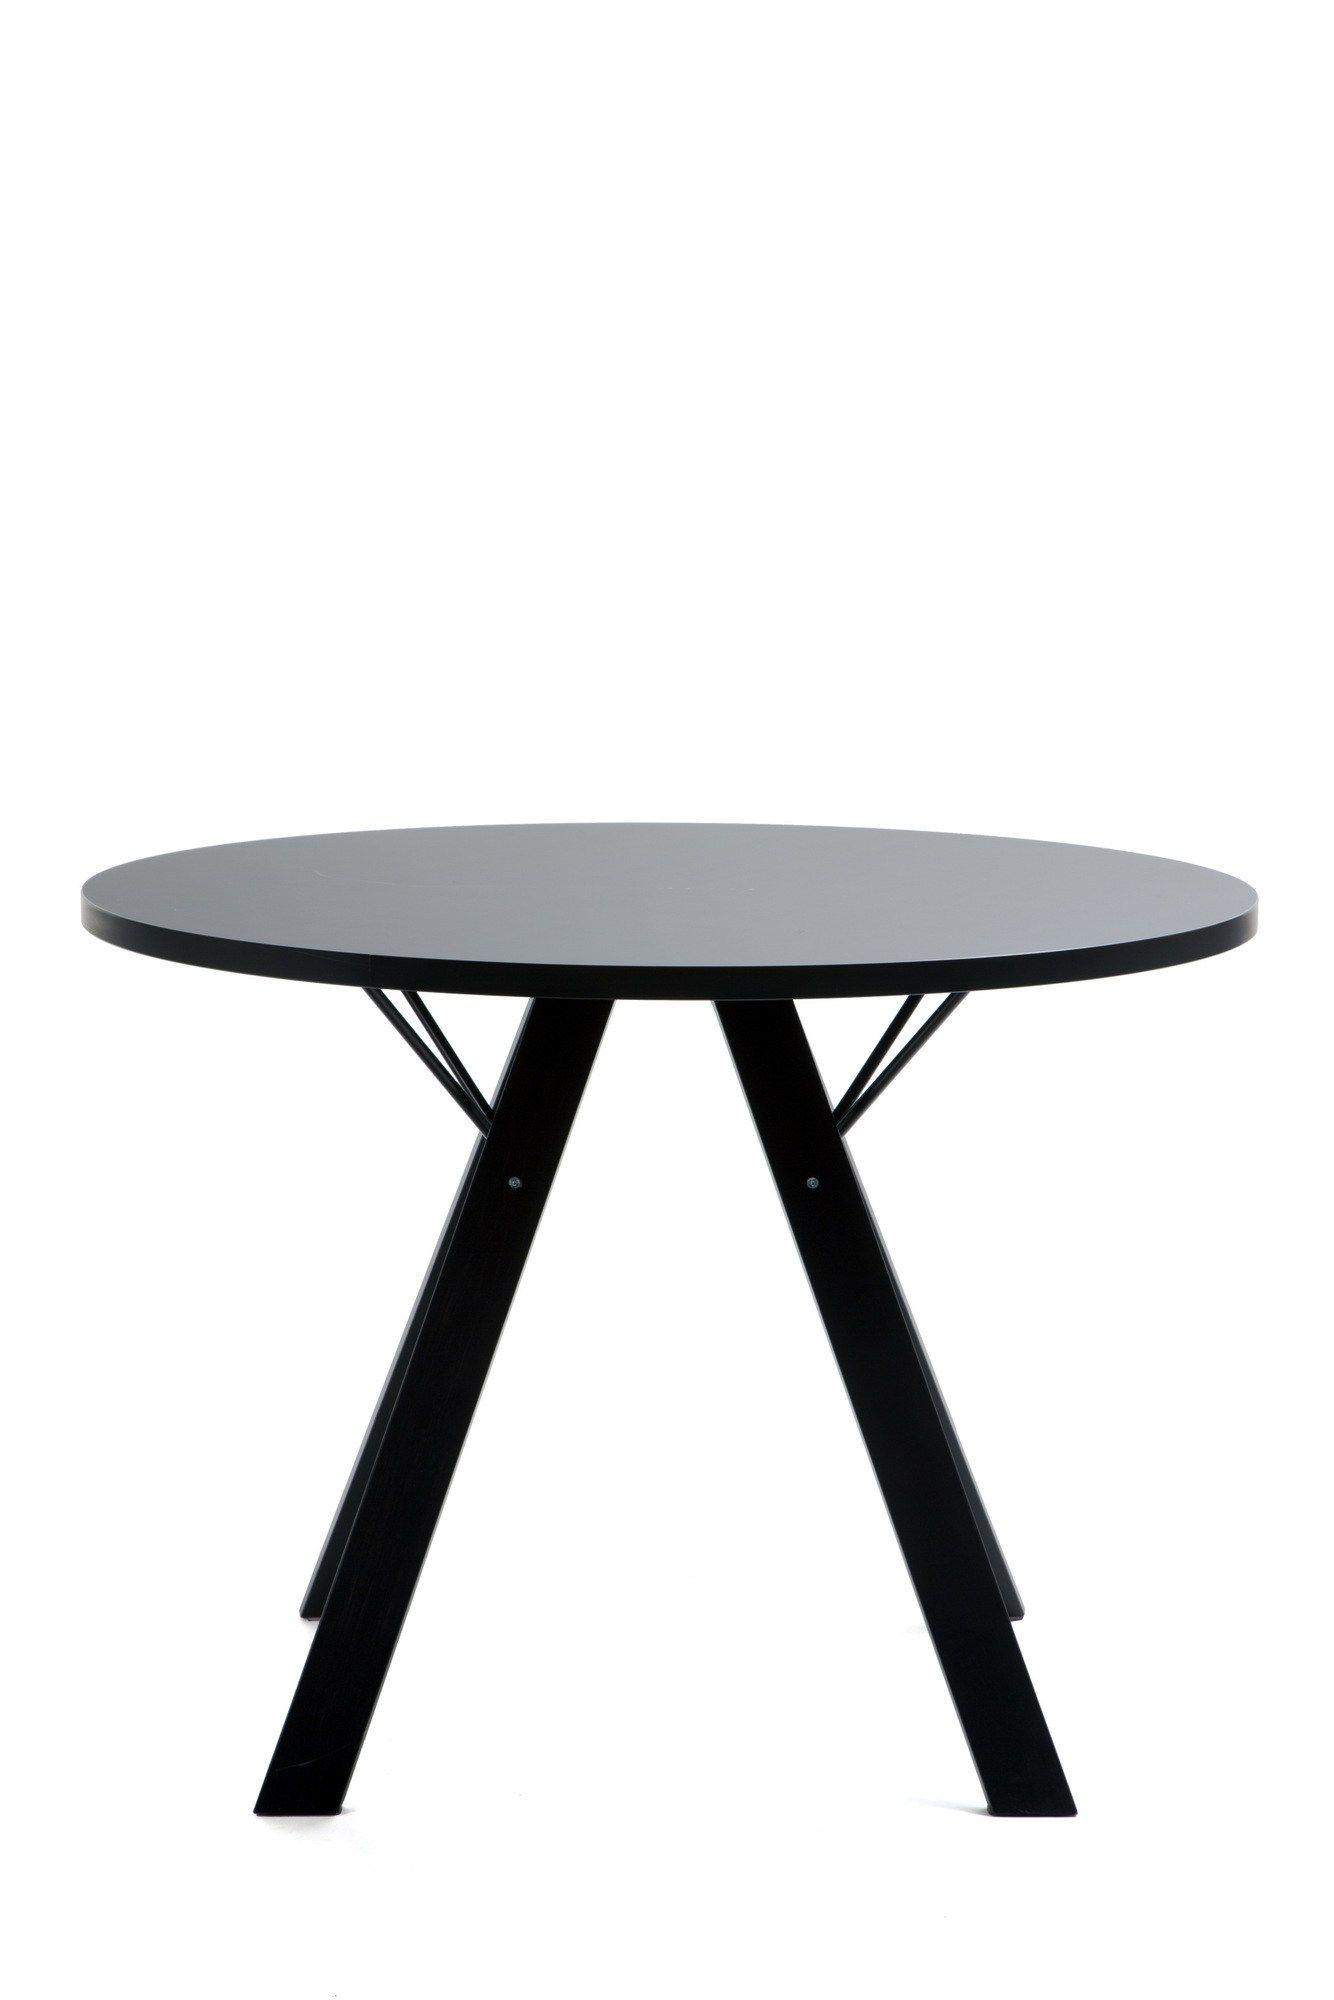 lab table ronde collection lab by inno interior oy design harri korhonen. Black Bedroom Furniture Sets. Home Design Ideas